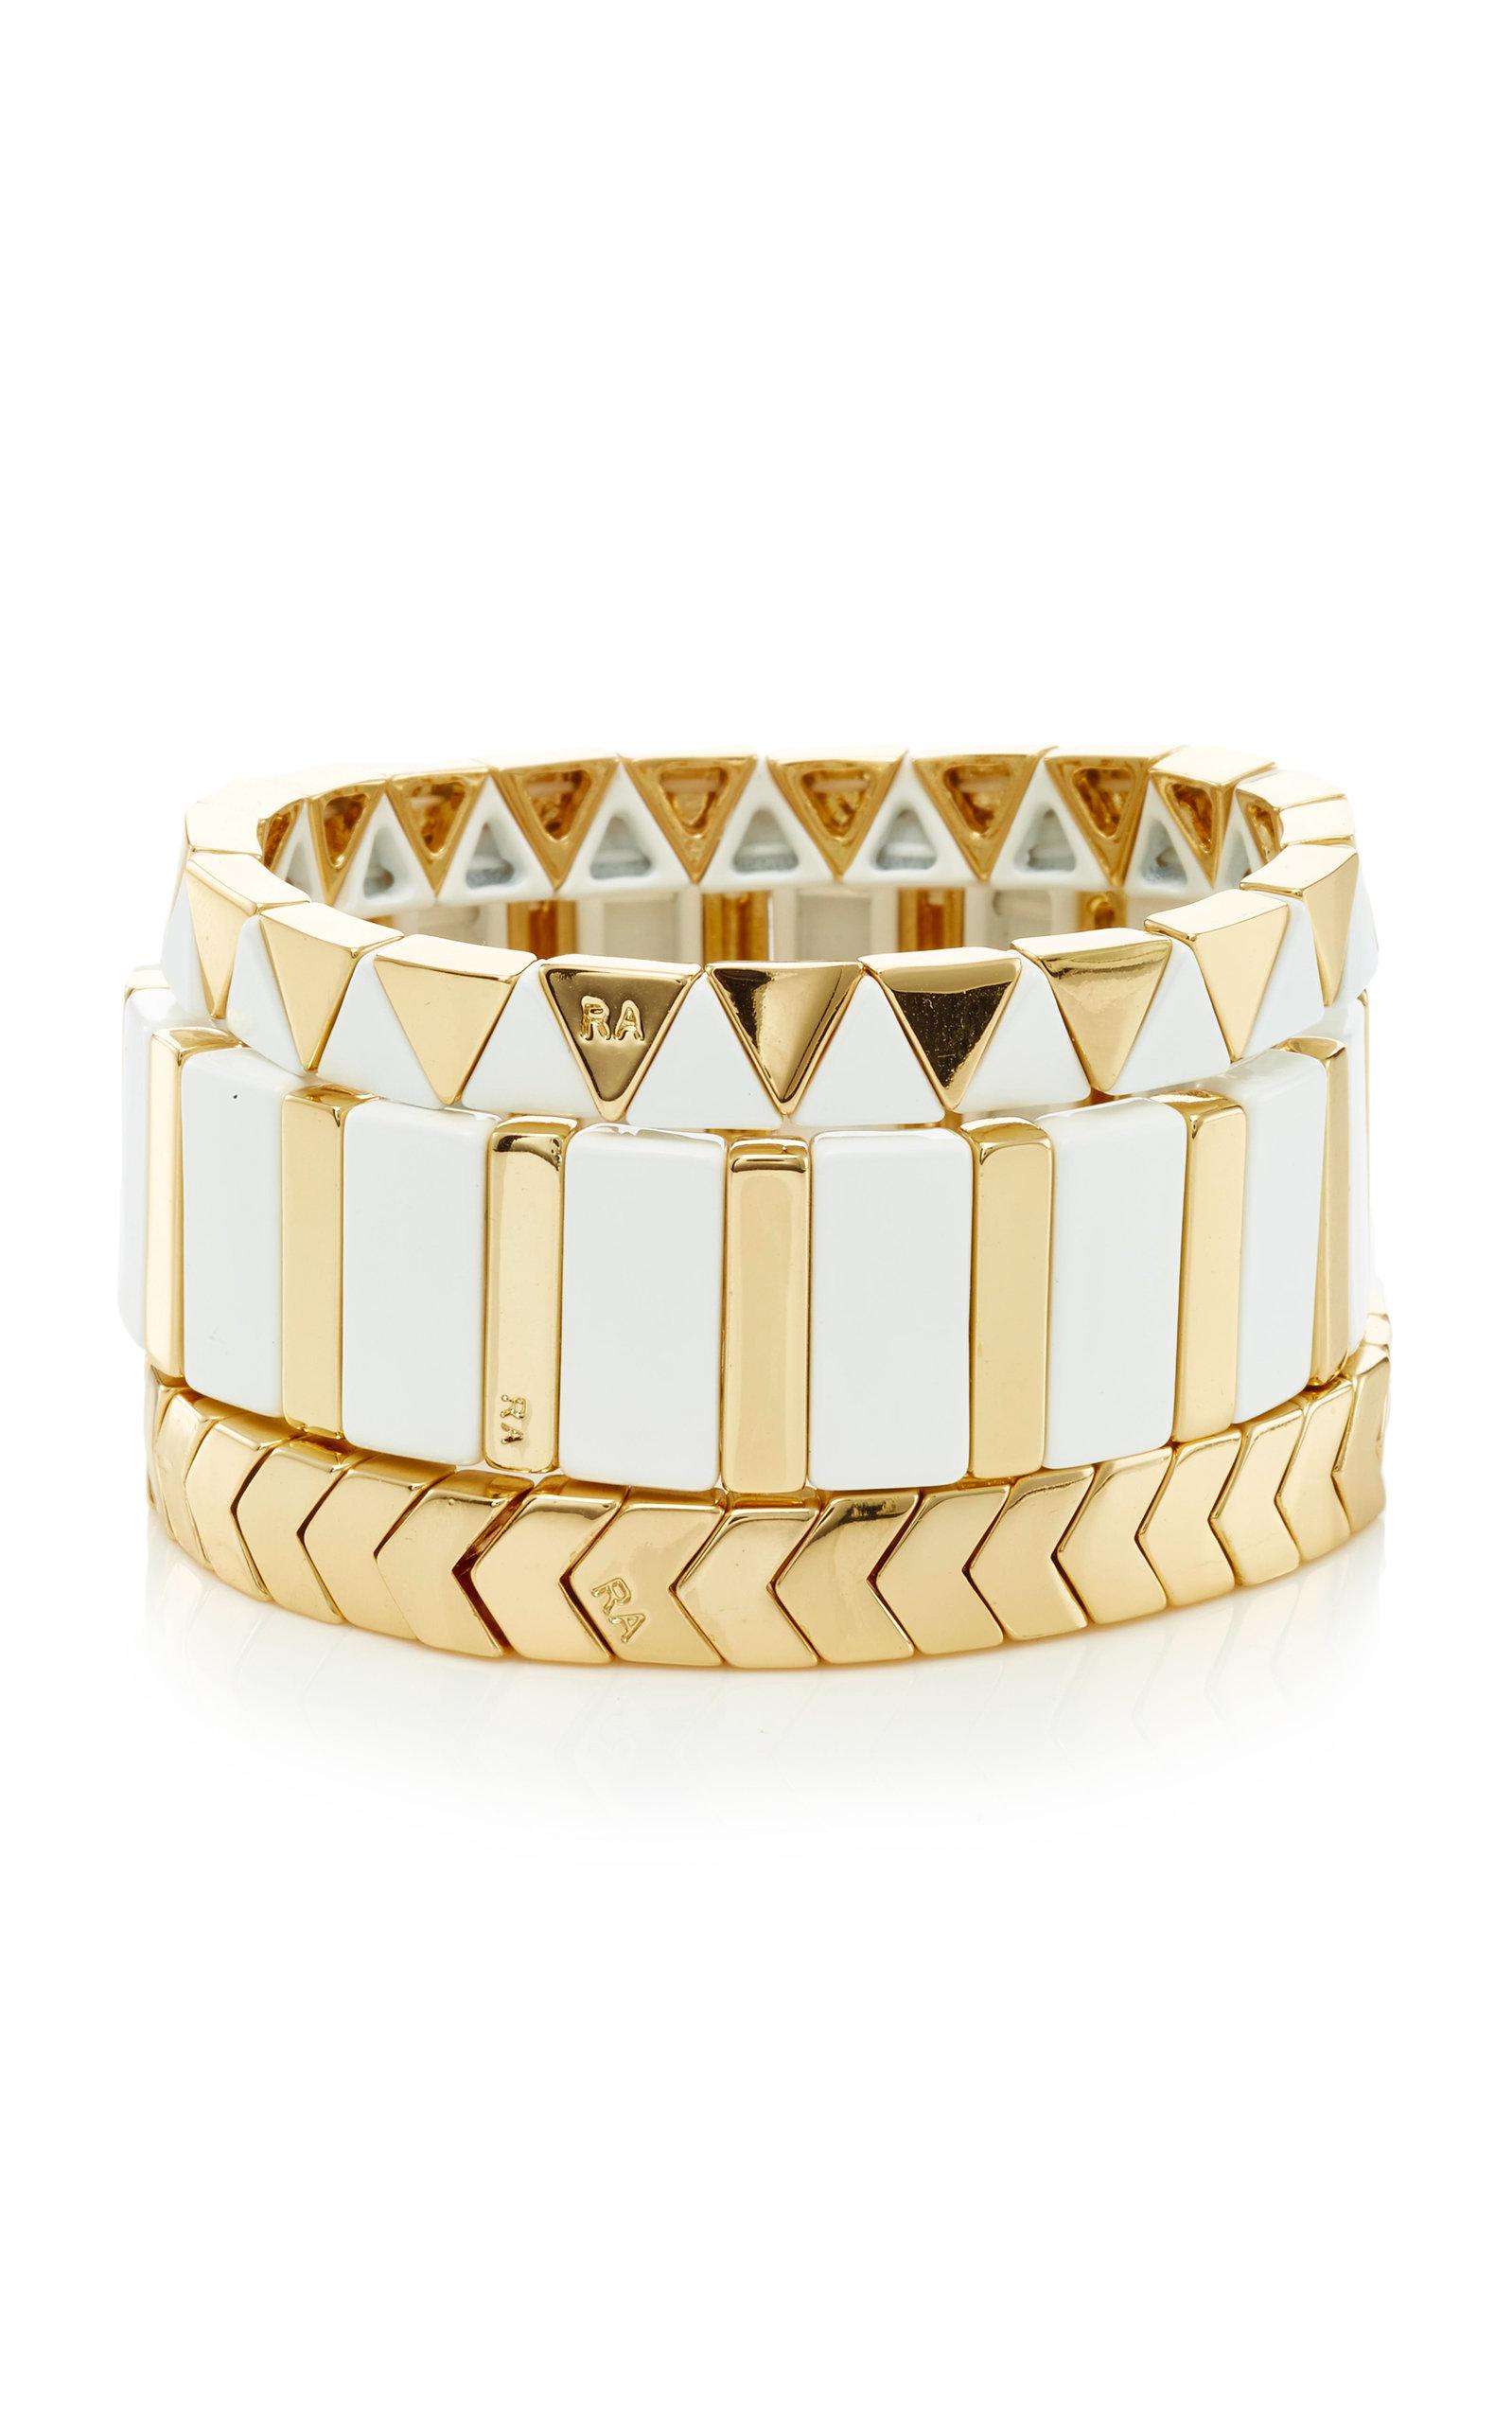 Set-Of-Three The Mixers Chevron Gold Bracelets Roxanne Assoulin UQGCCVh